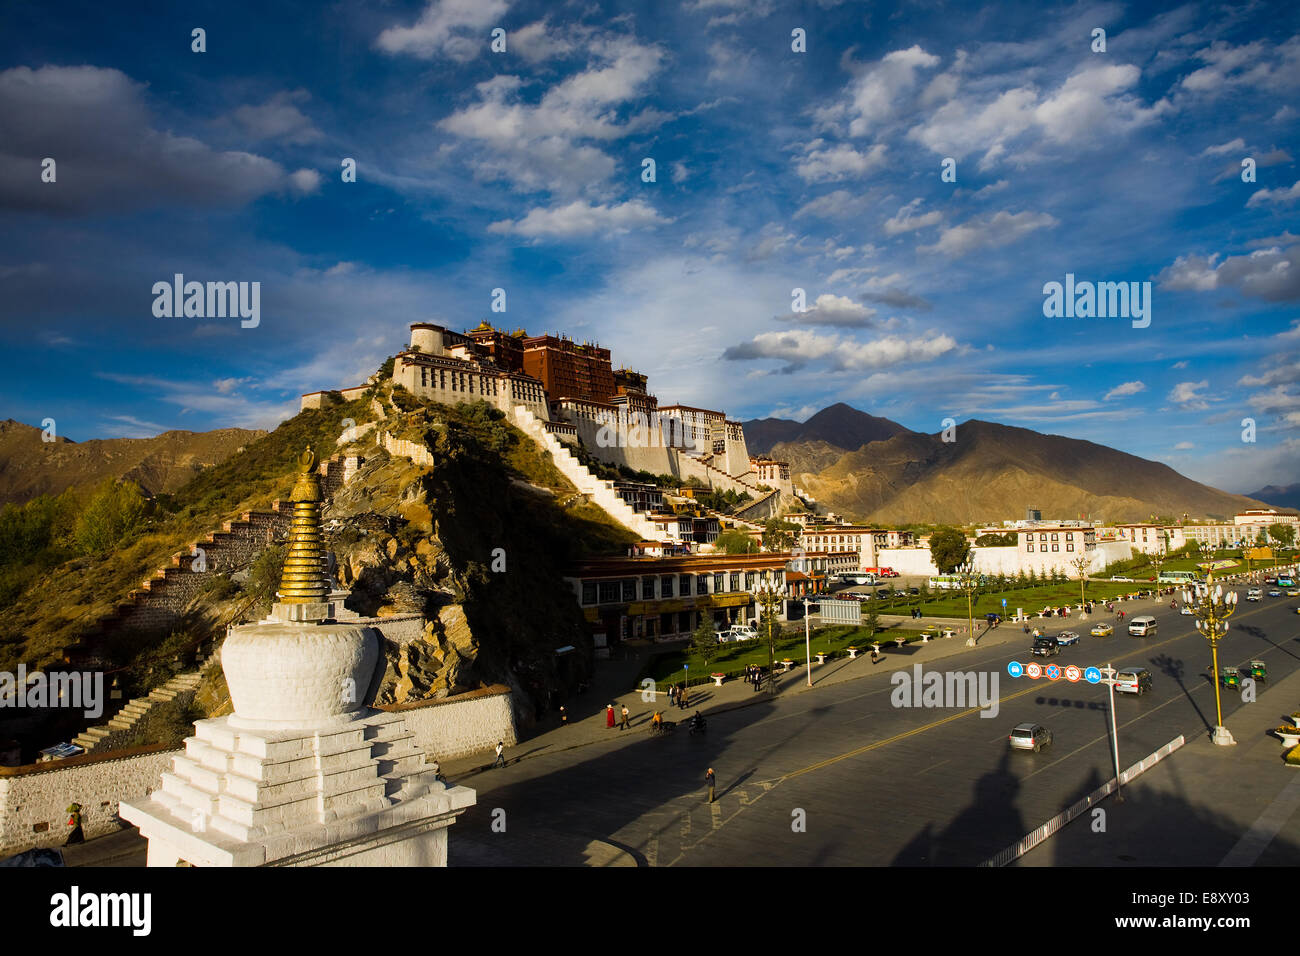 Tibetan Potala Palace stupa and blue sky - Stock Image